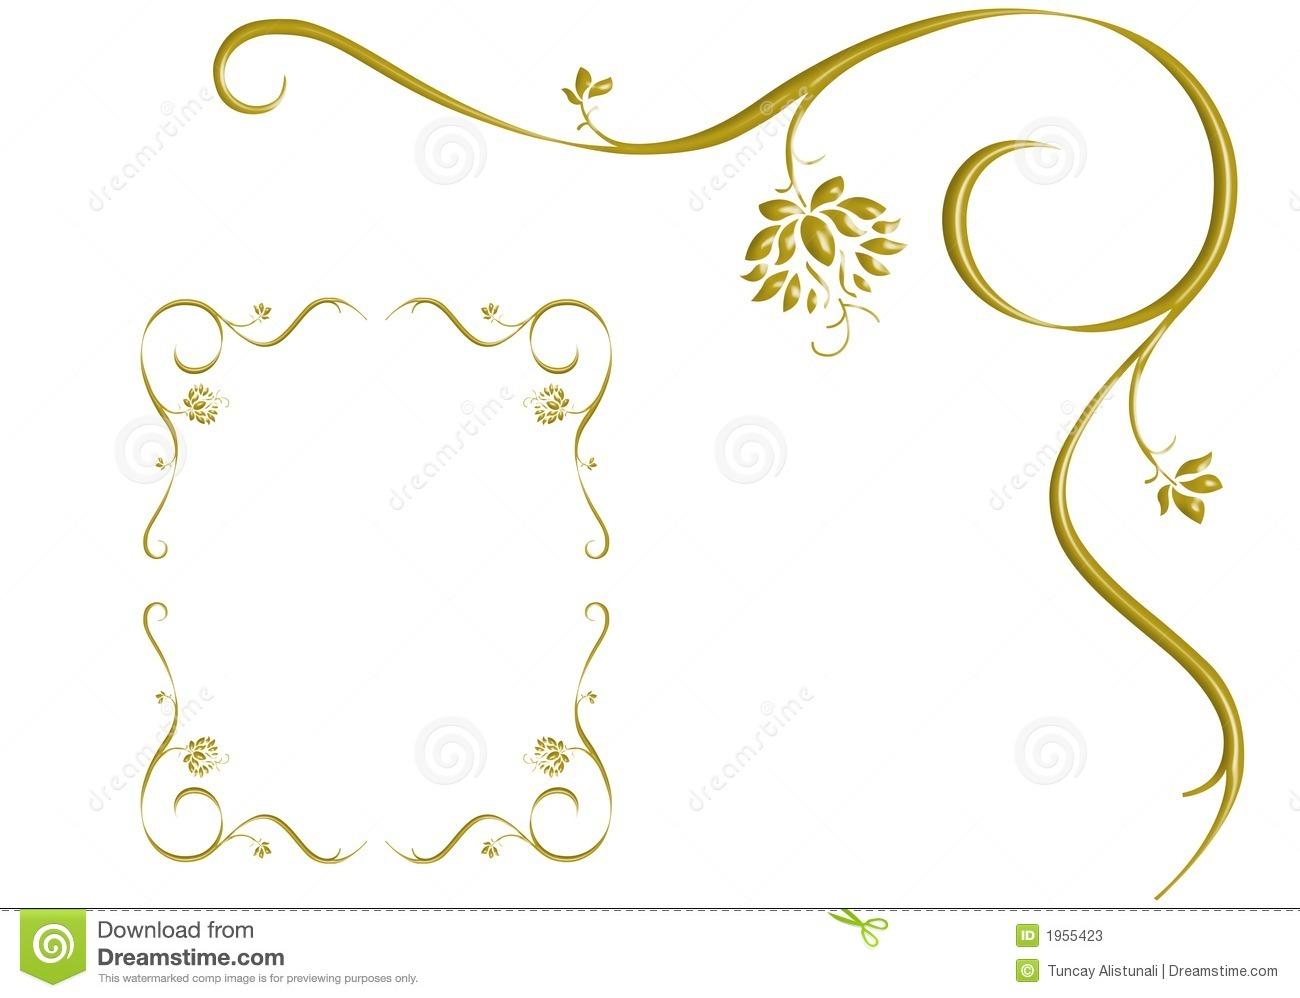 16 basic border designs images hand embroidery border for Frame designs